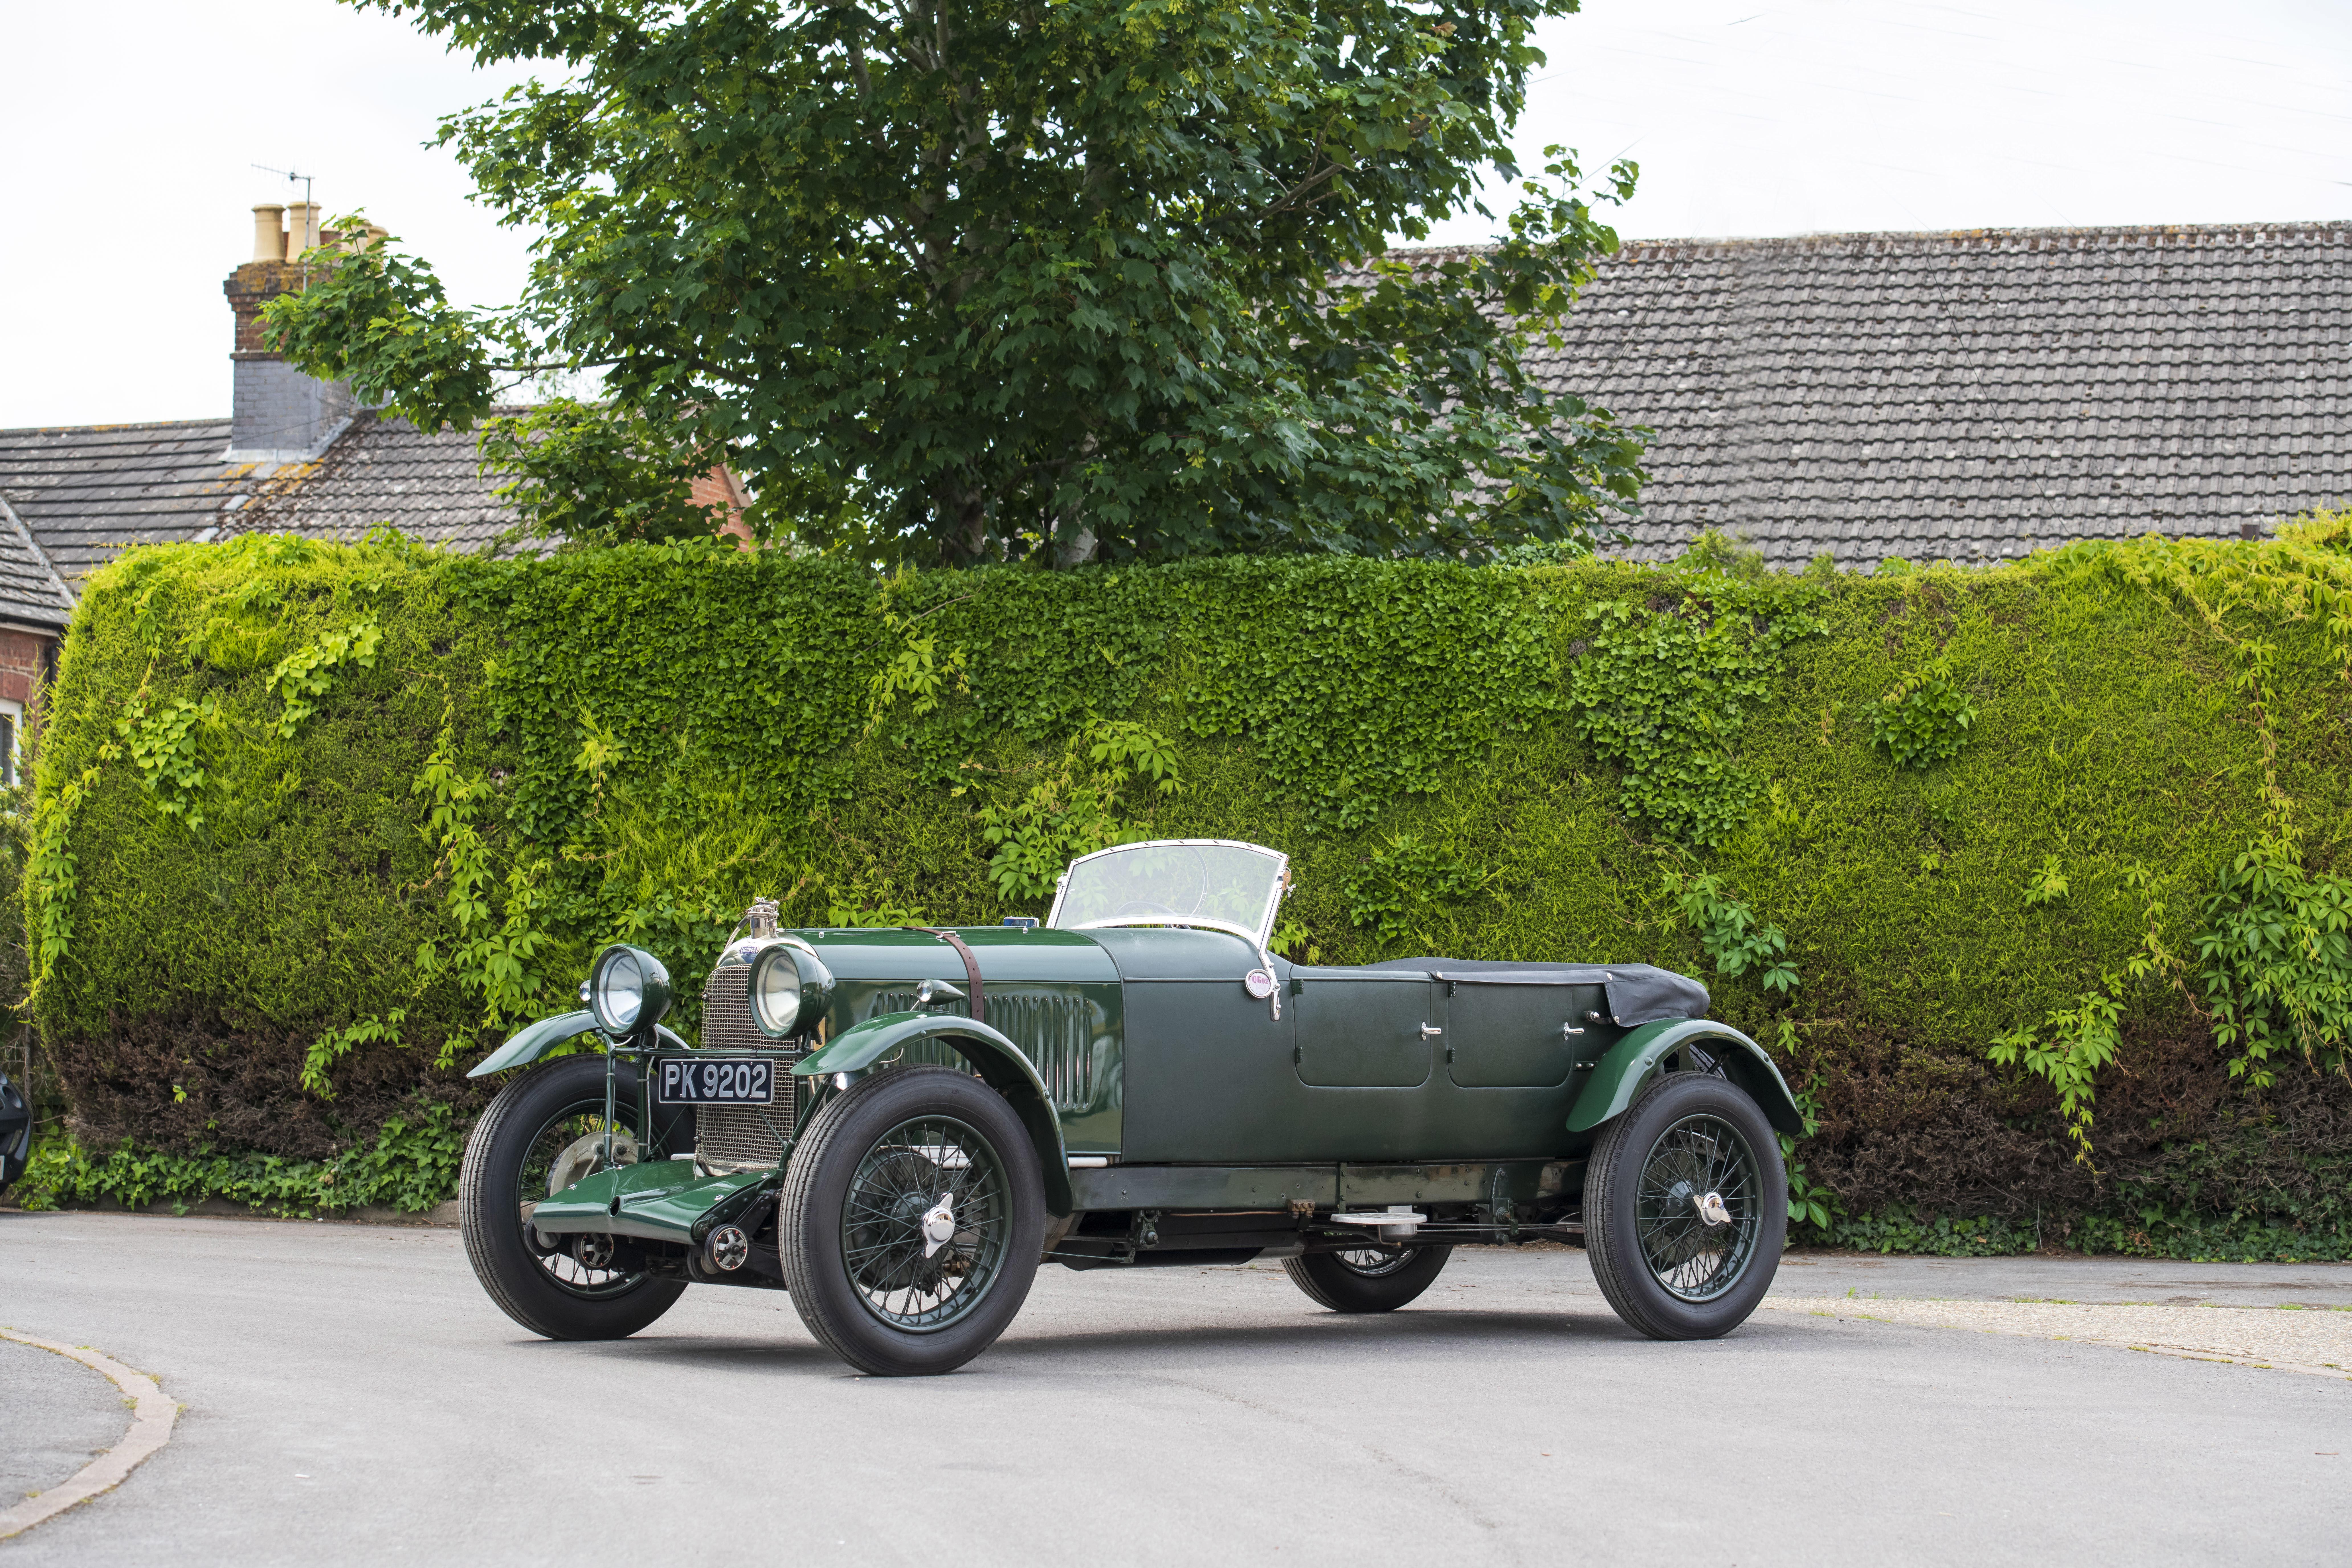 1929 Lagonda 2-Litre Low Chassis 9202